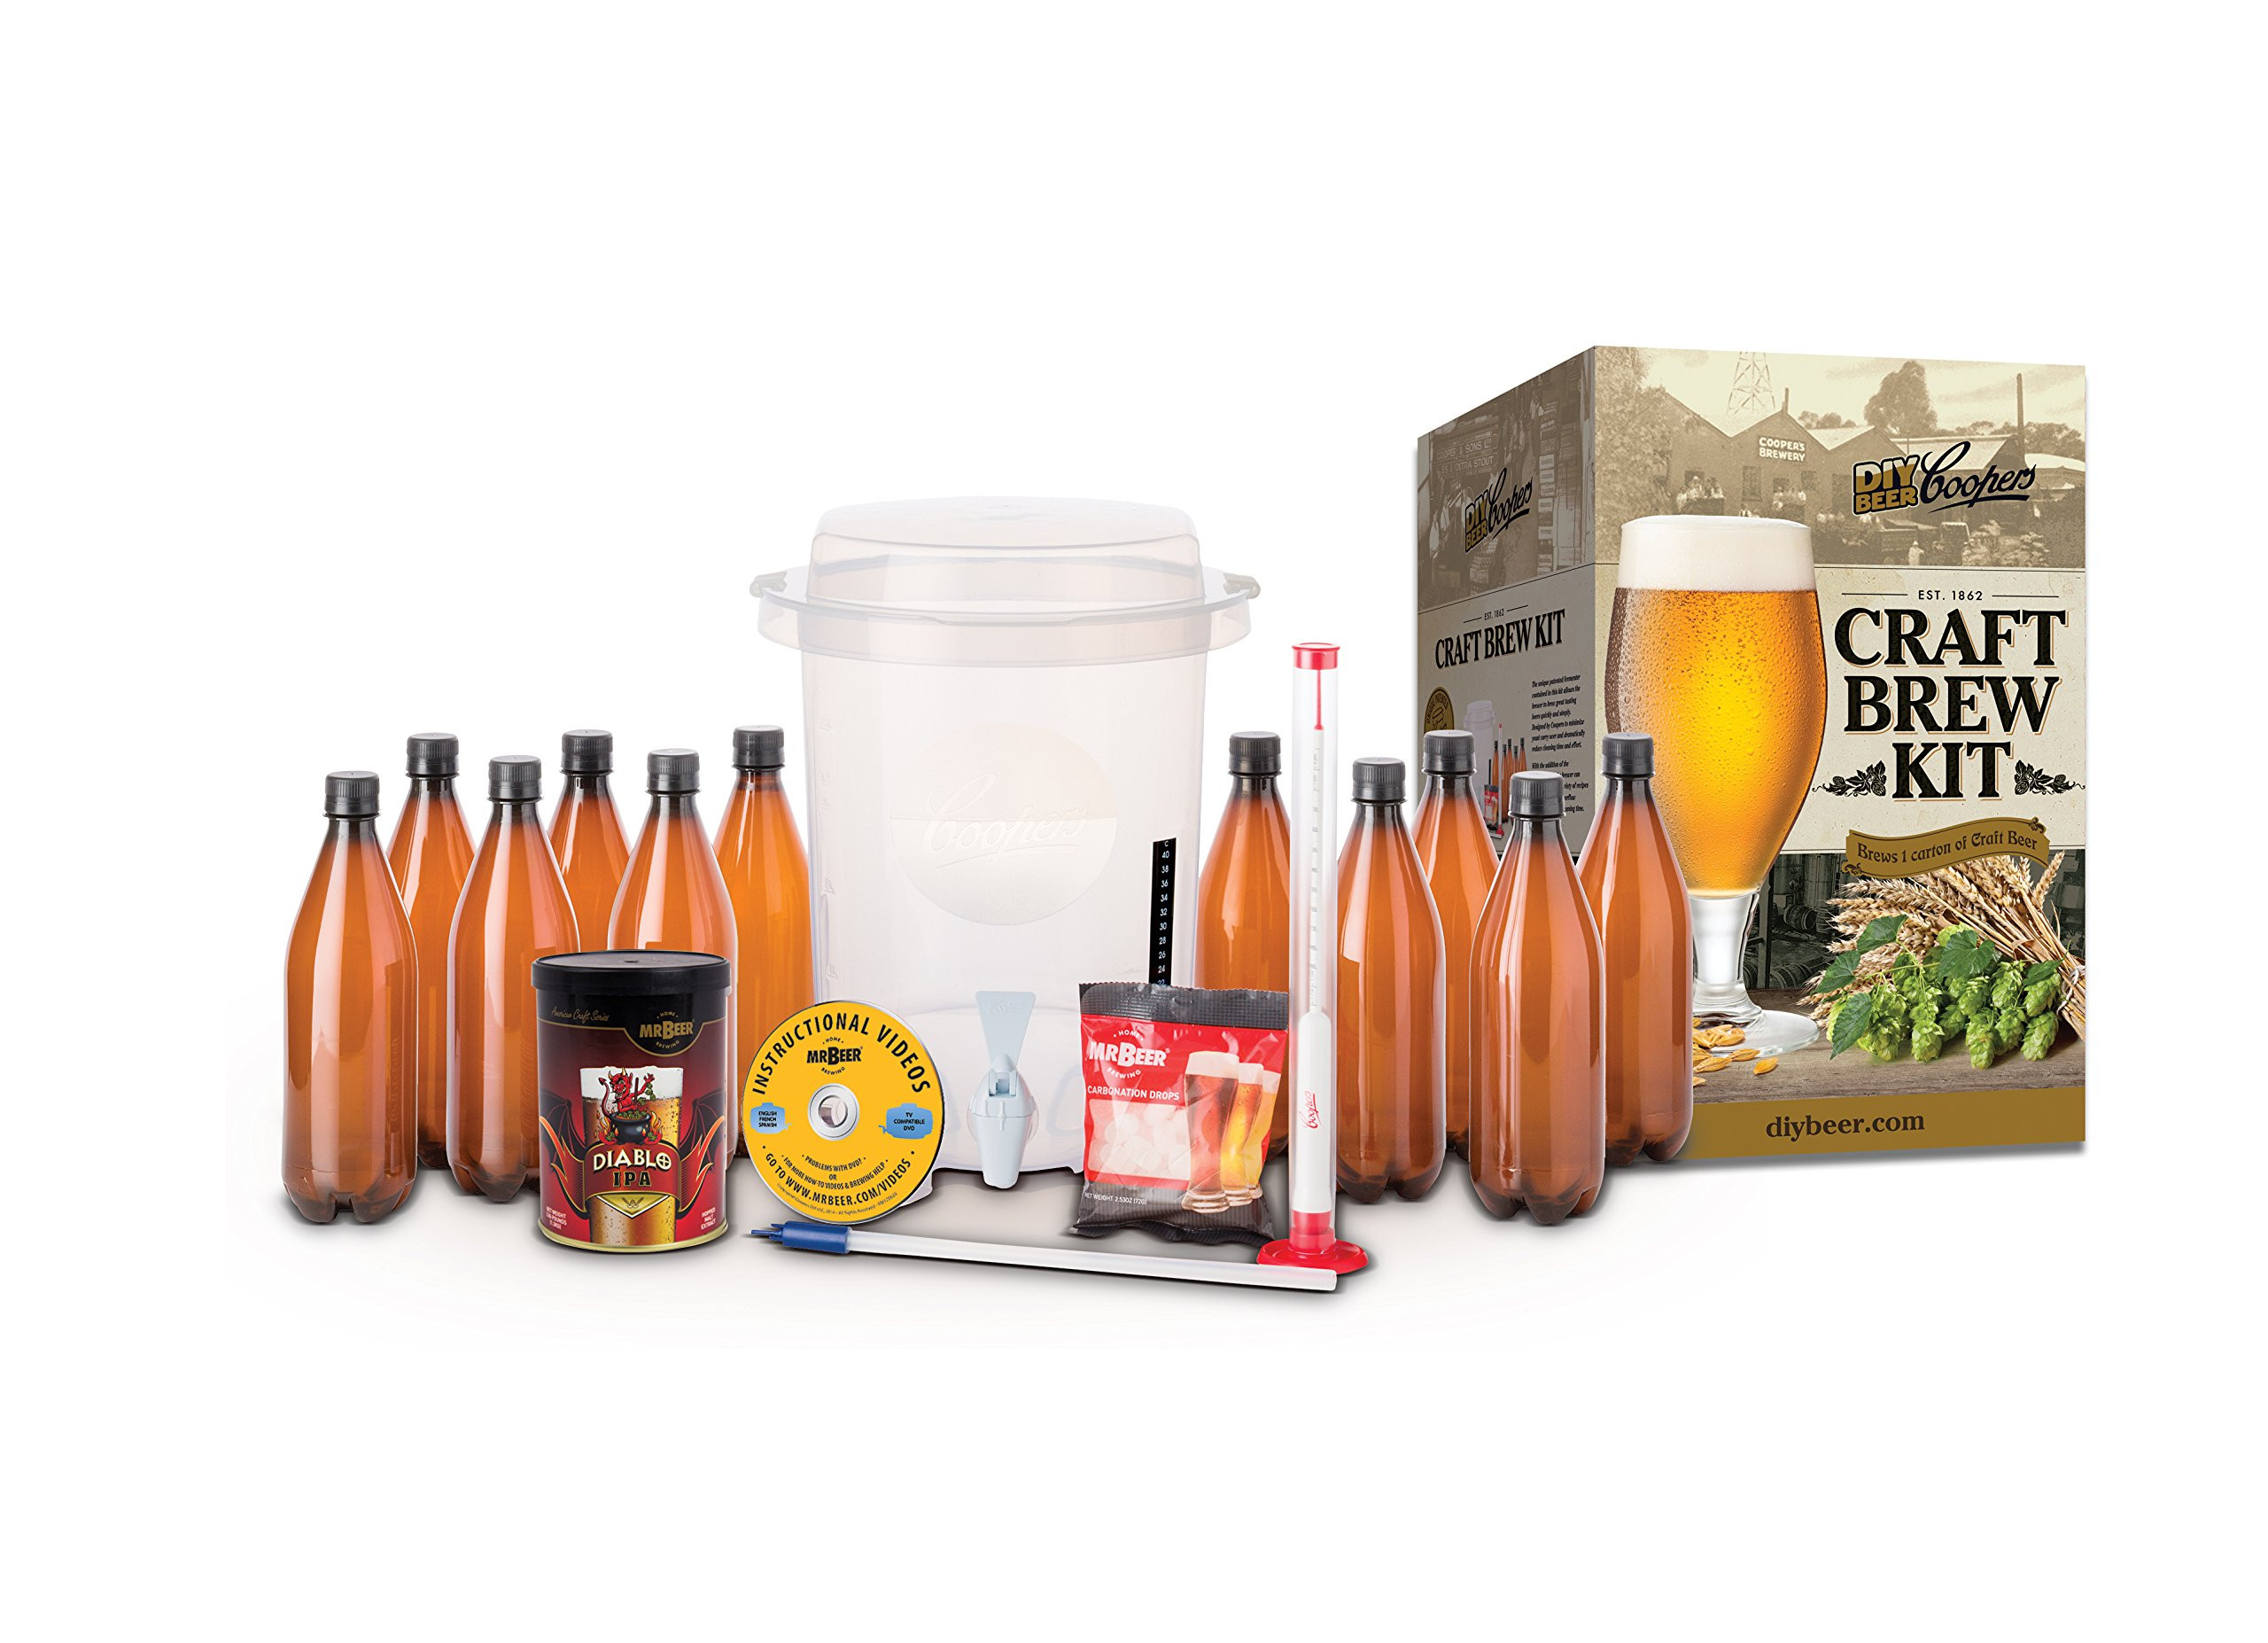 DIY Beer Kit  Coopers DIY Home Brewing Craft Beer Kit 2 Gallon 2 Gallon Kit